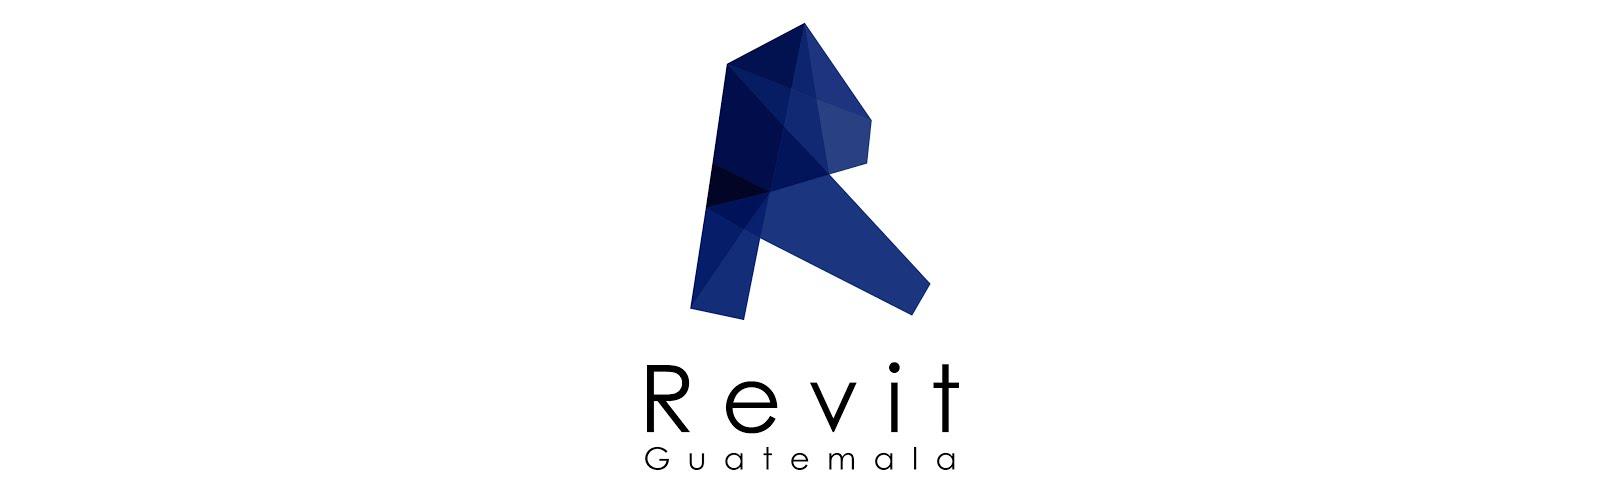 Revit Guatemala